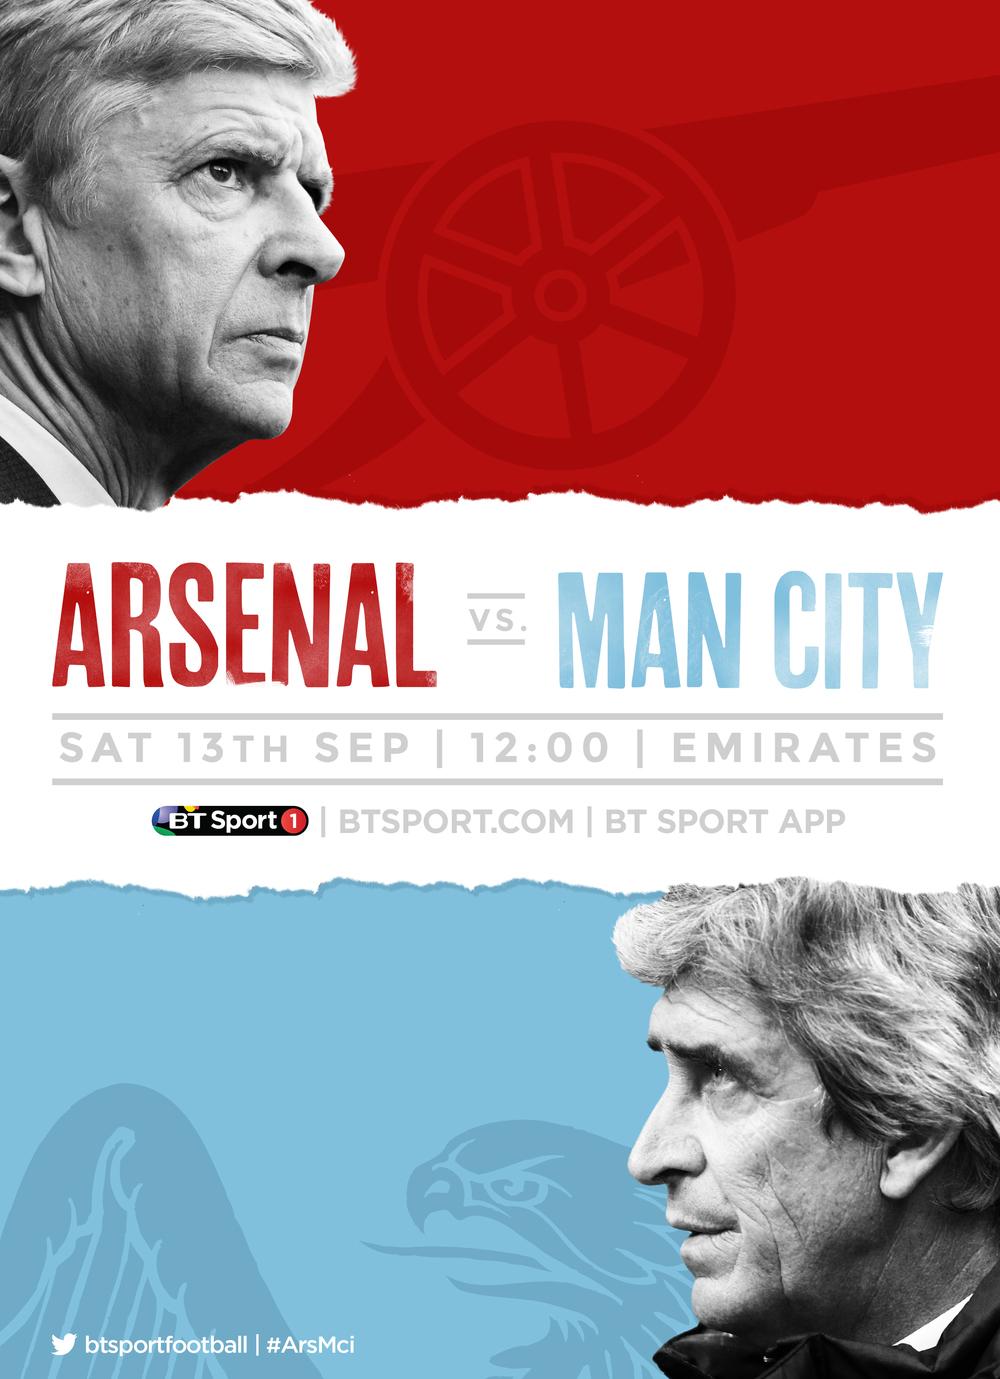 ArsenalVsCityv3.jpg